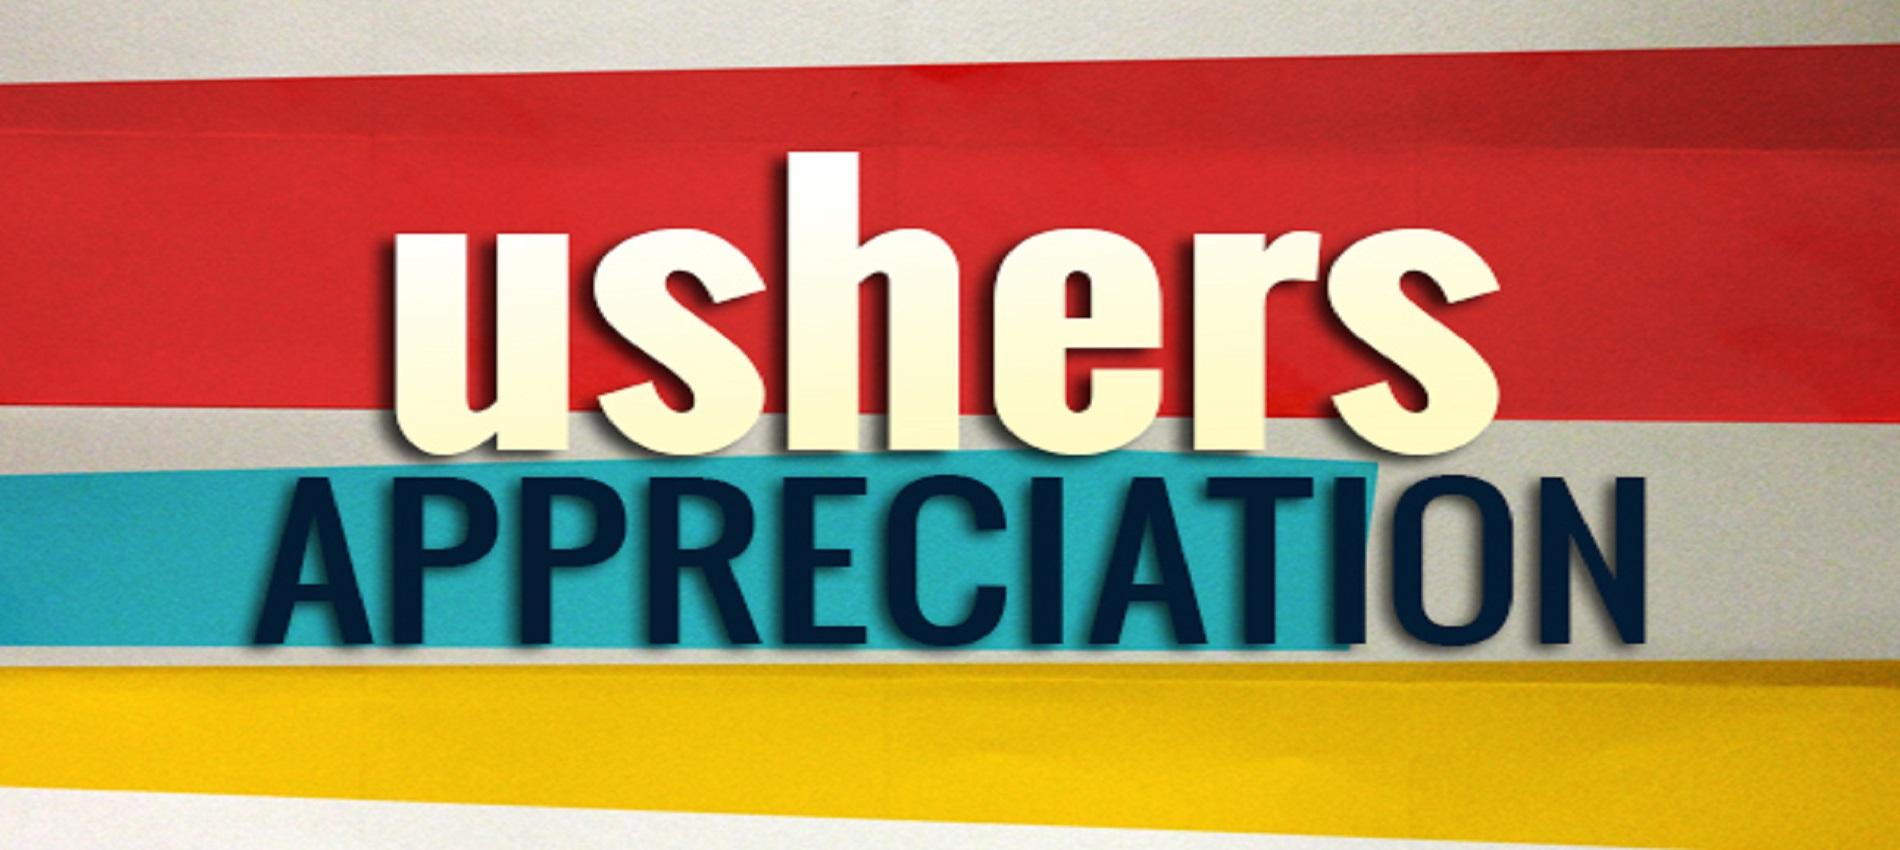 Ushers Appreciation Banner